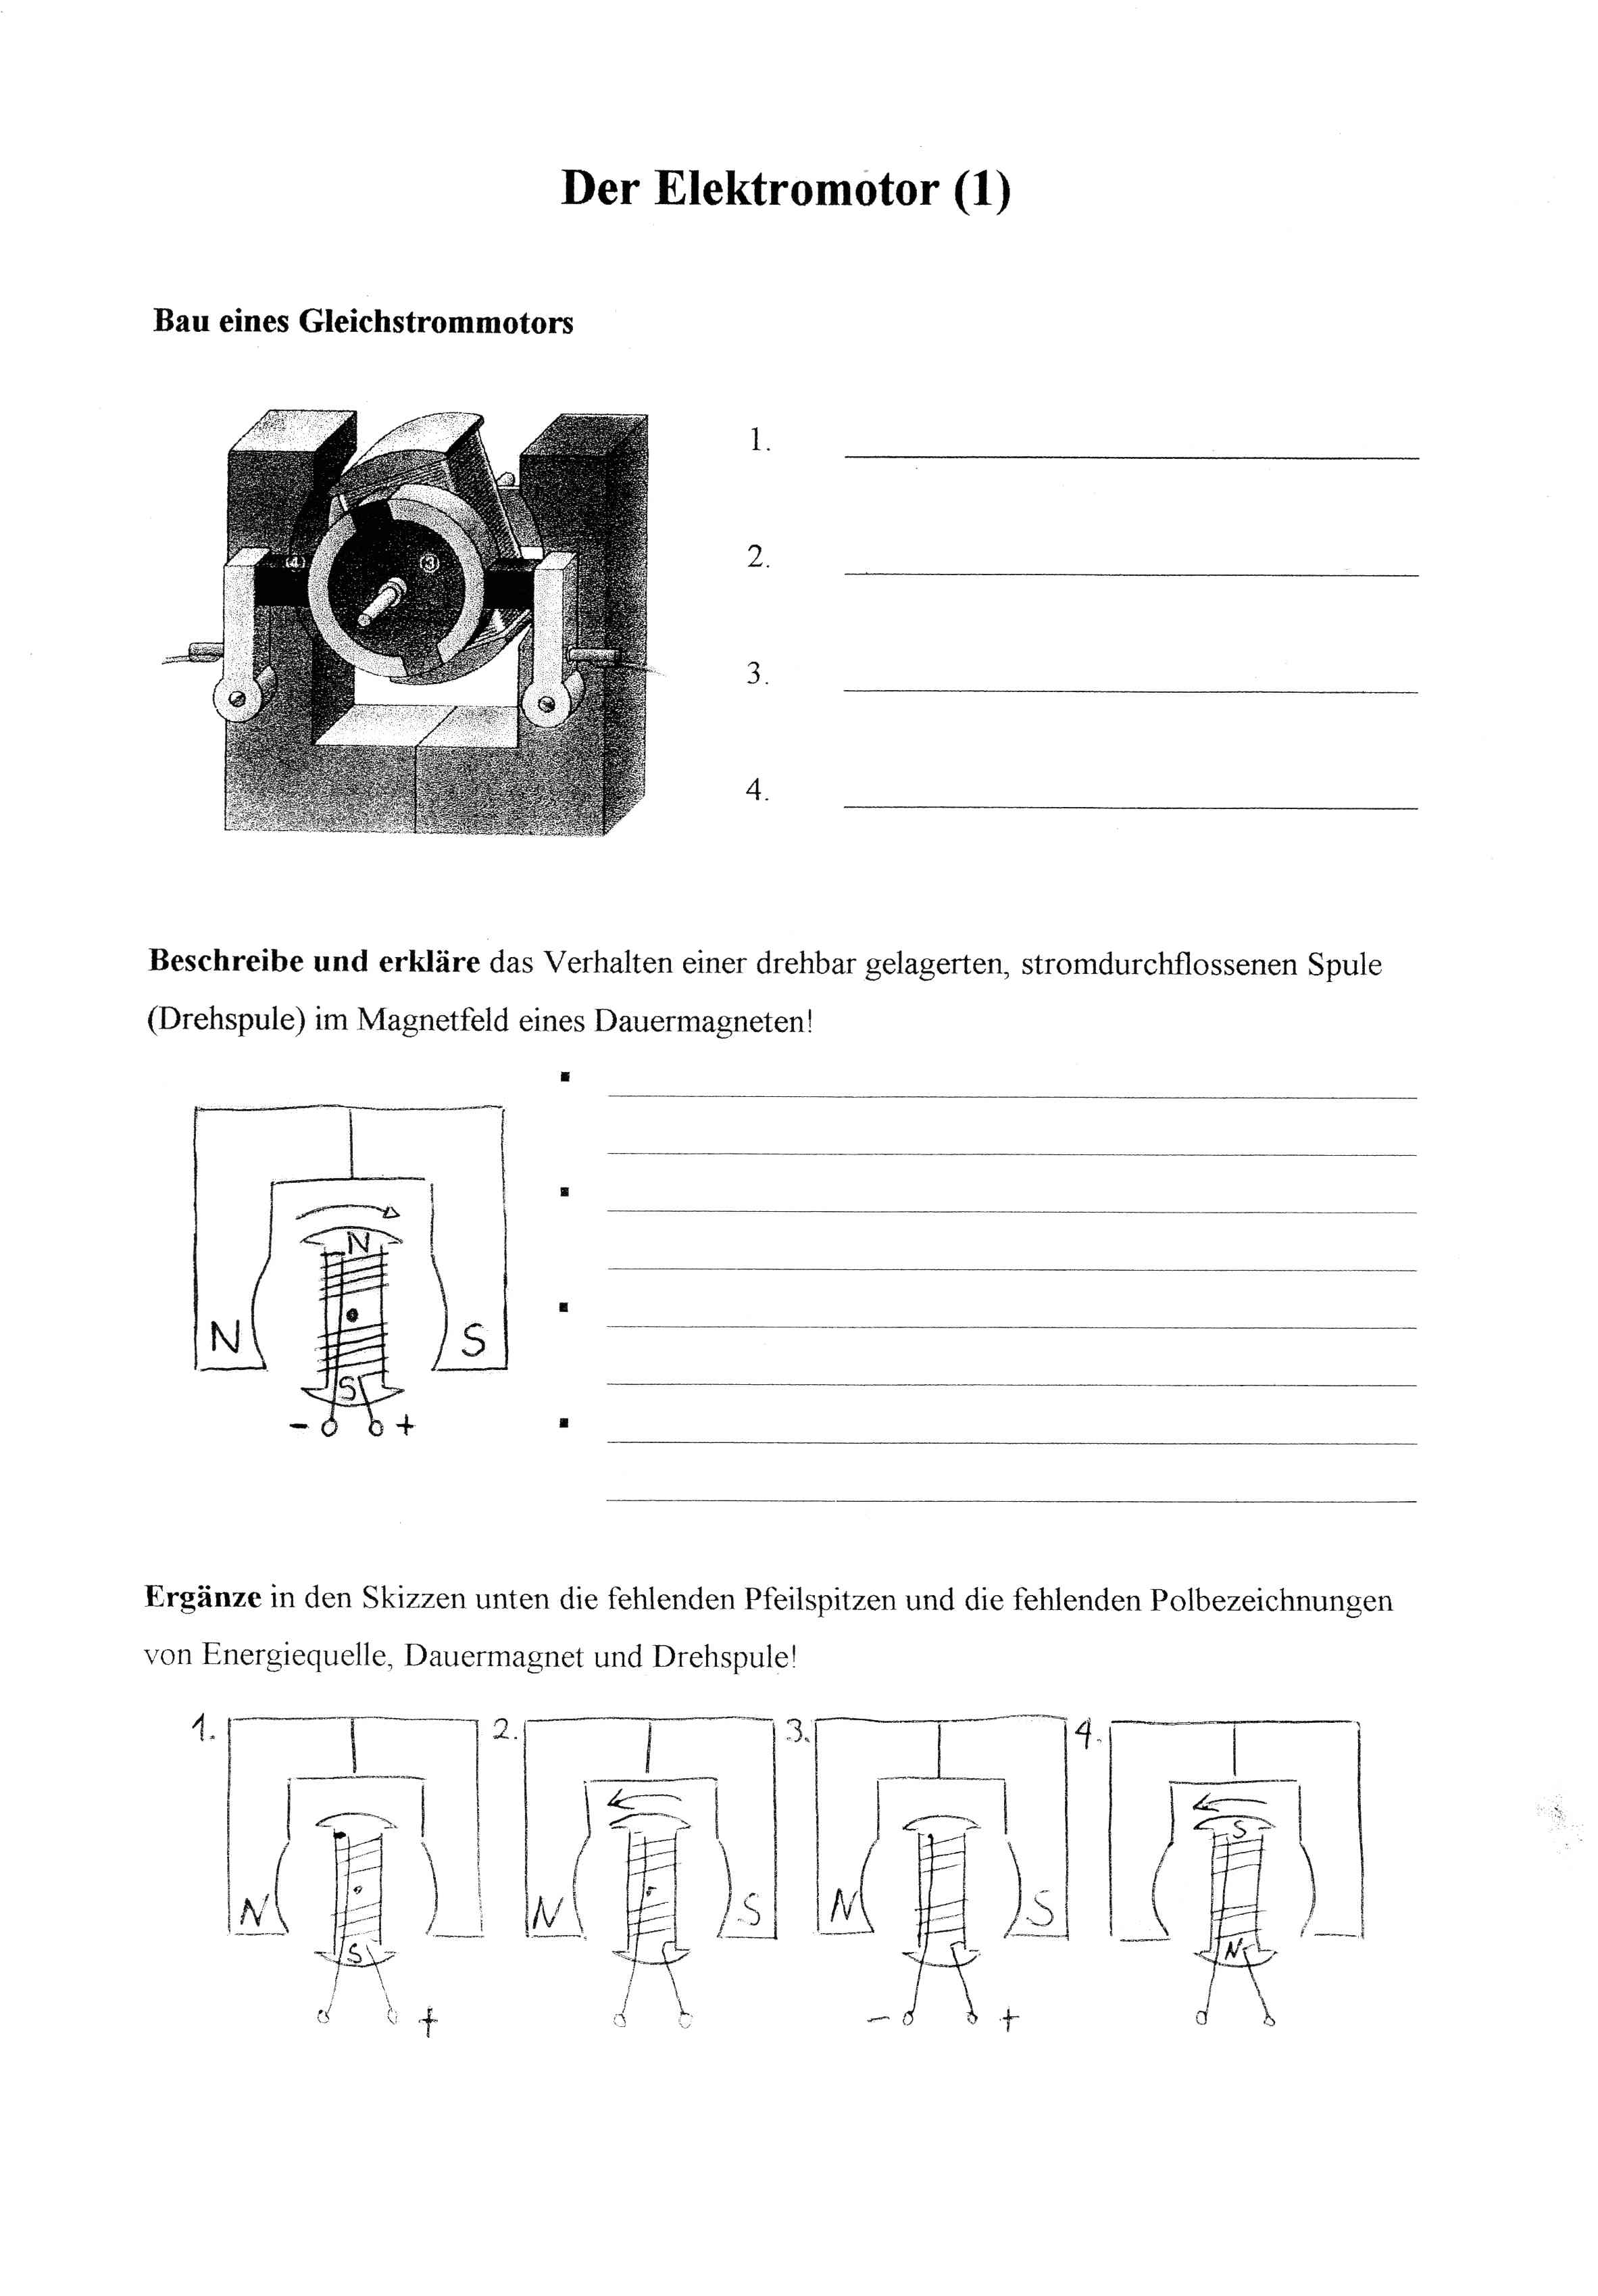 Berühmt Elektrostatik Arbeitsblatt Bilder - Mathe Arbeitsblatt ...